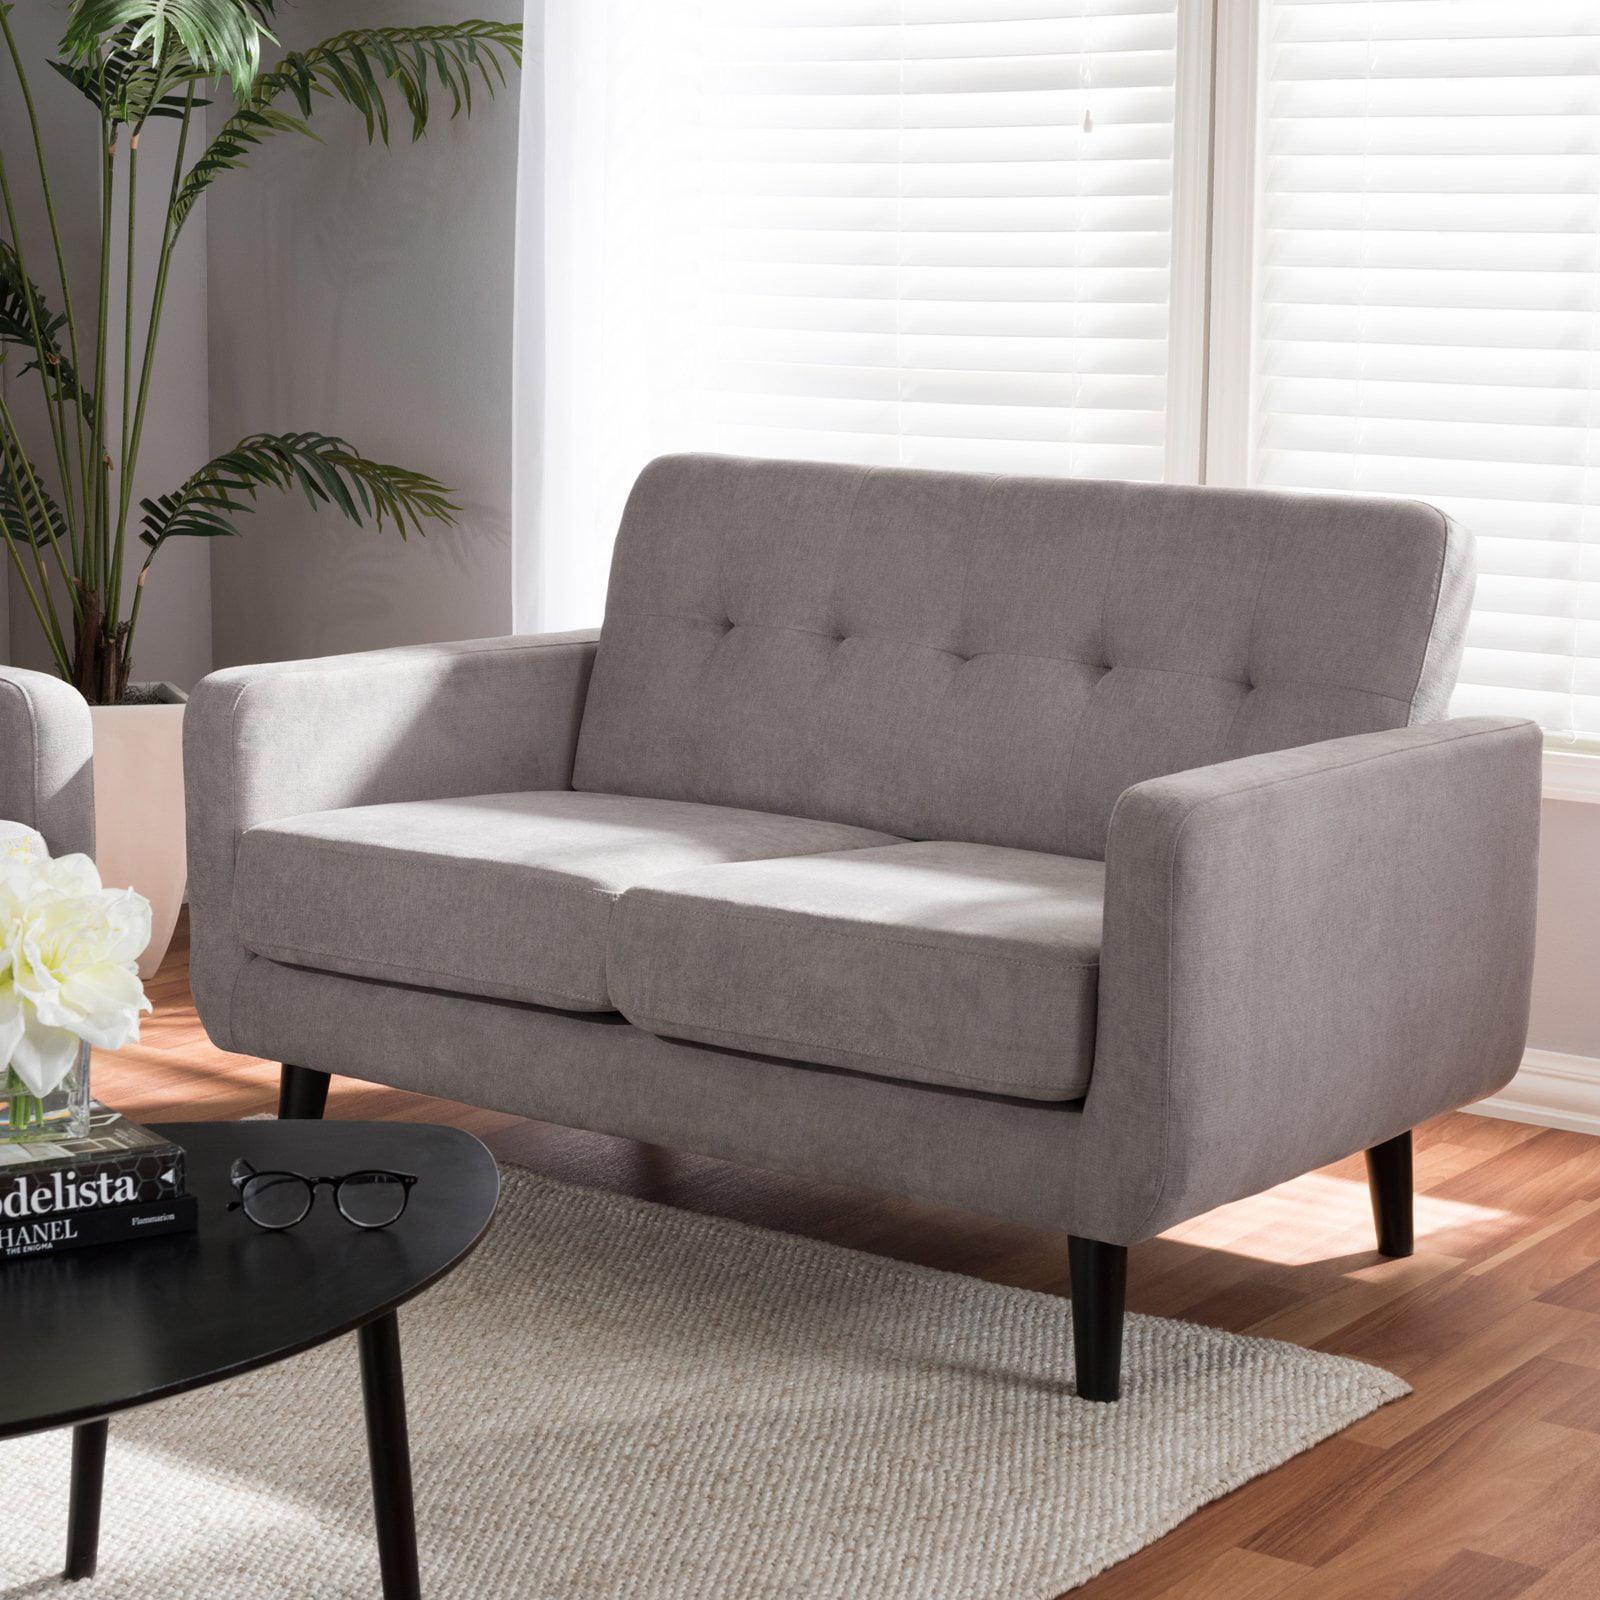 Baxton Studio Carina Mid-Century Modern Light Grey Fabric Upholstered Loveseat